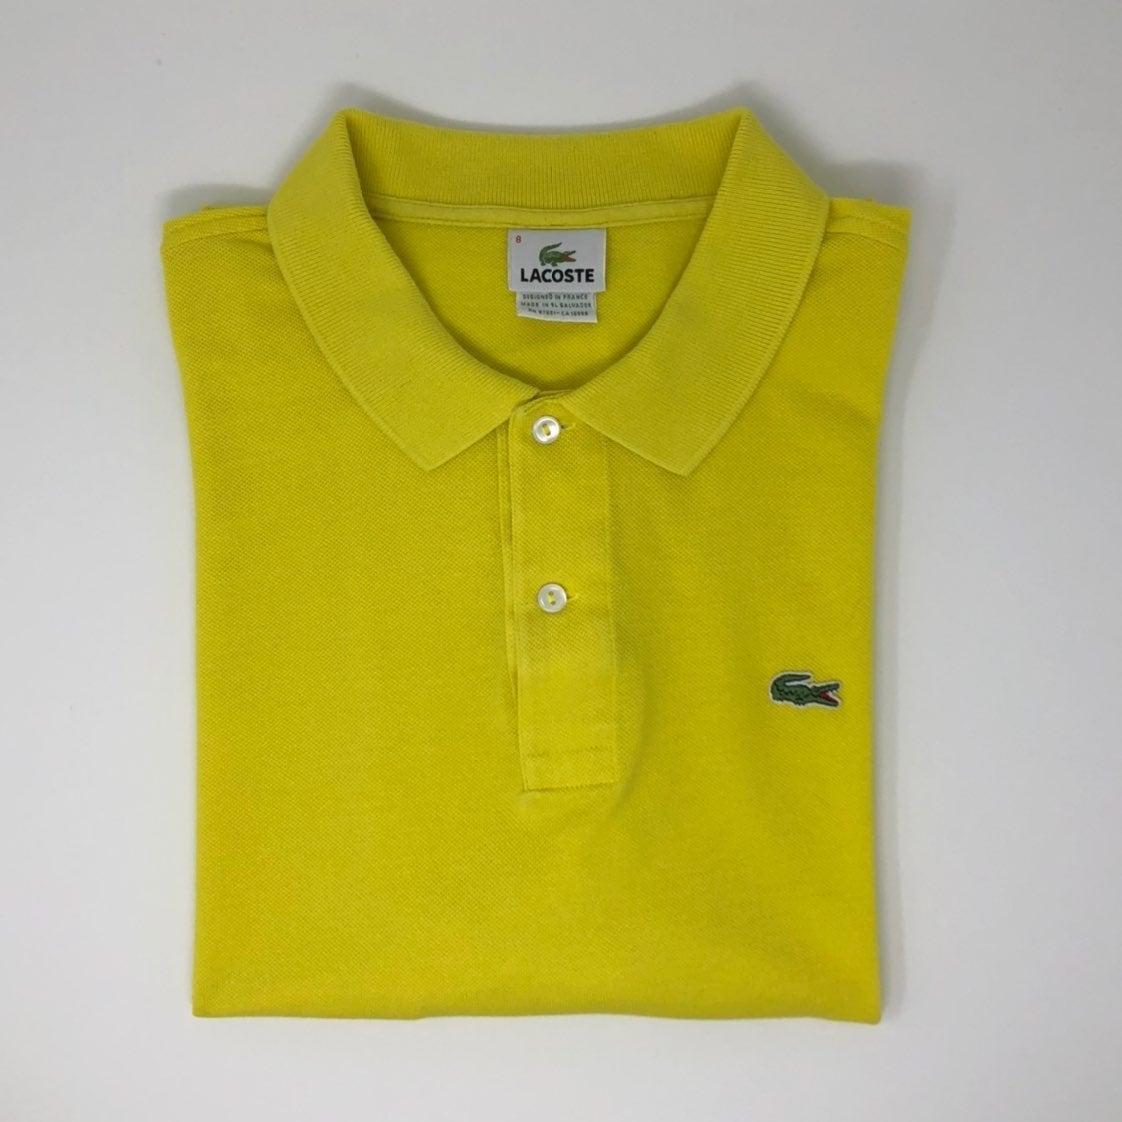 Lacoste Yellow Polo Shirt Size 8